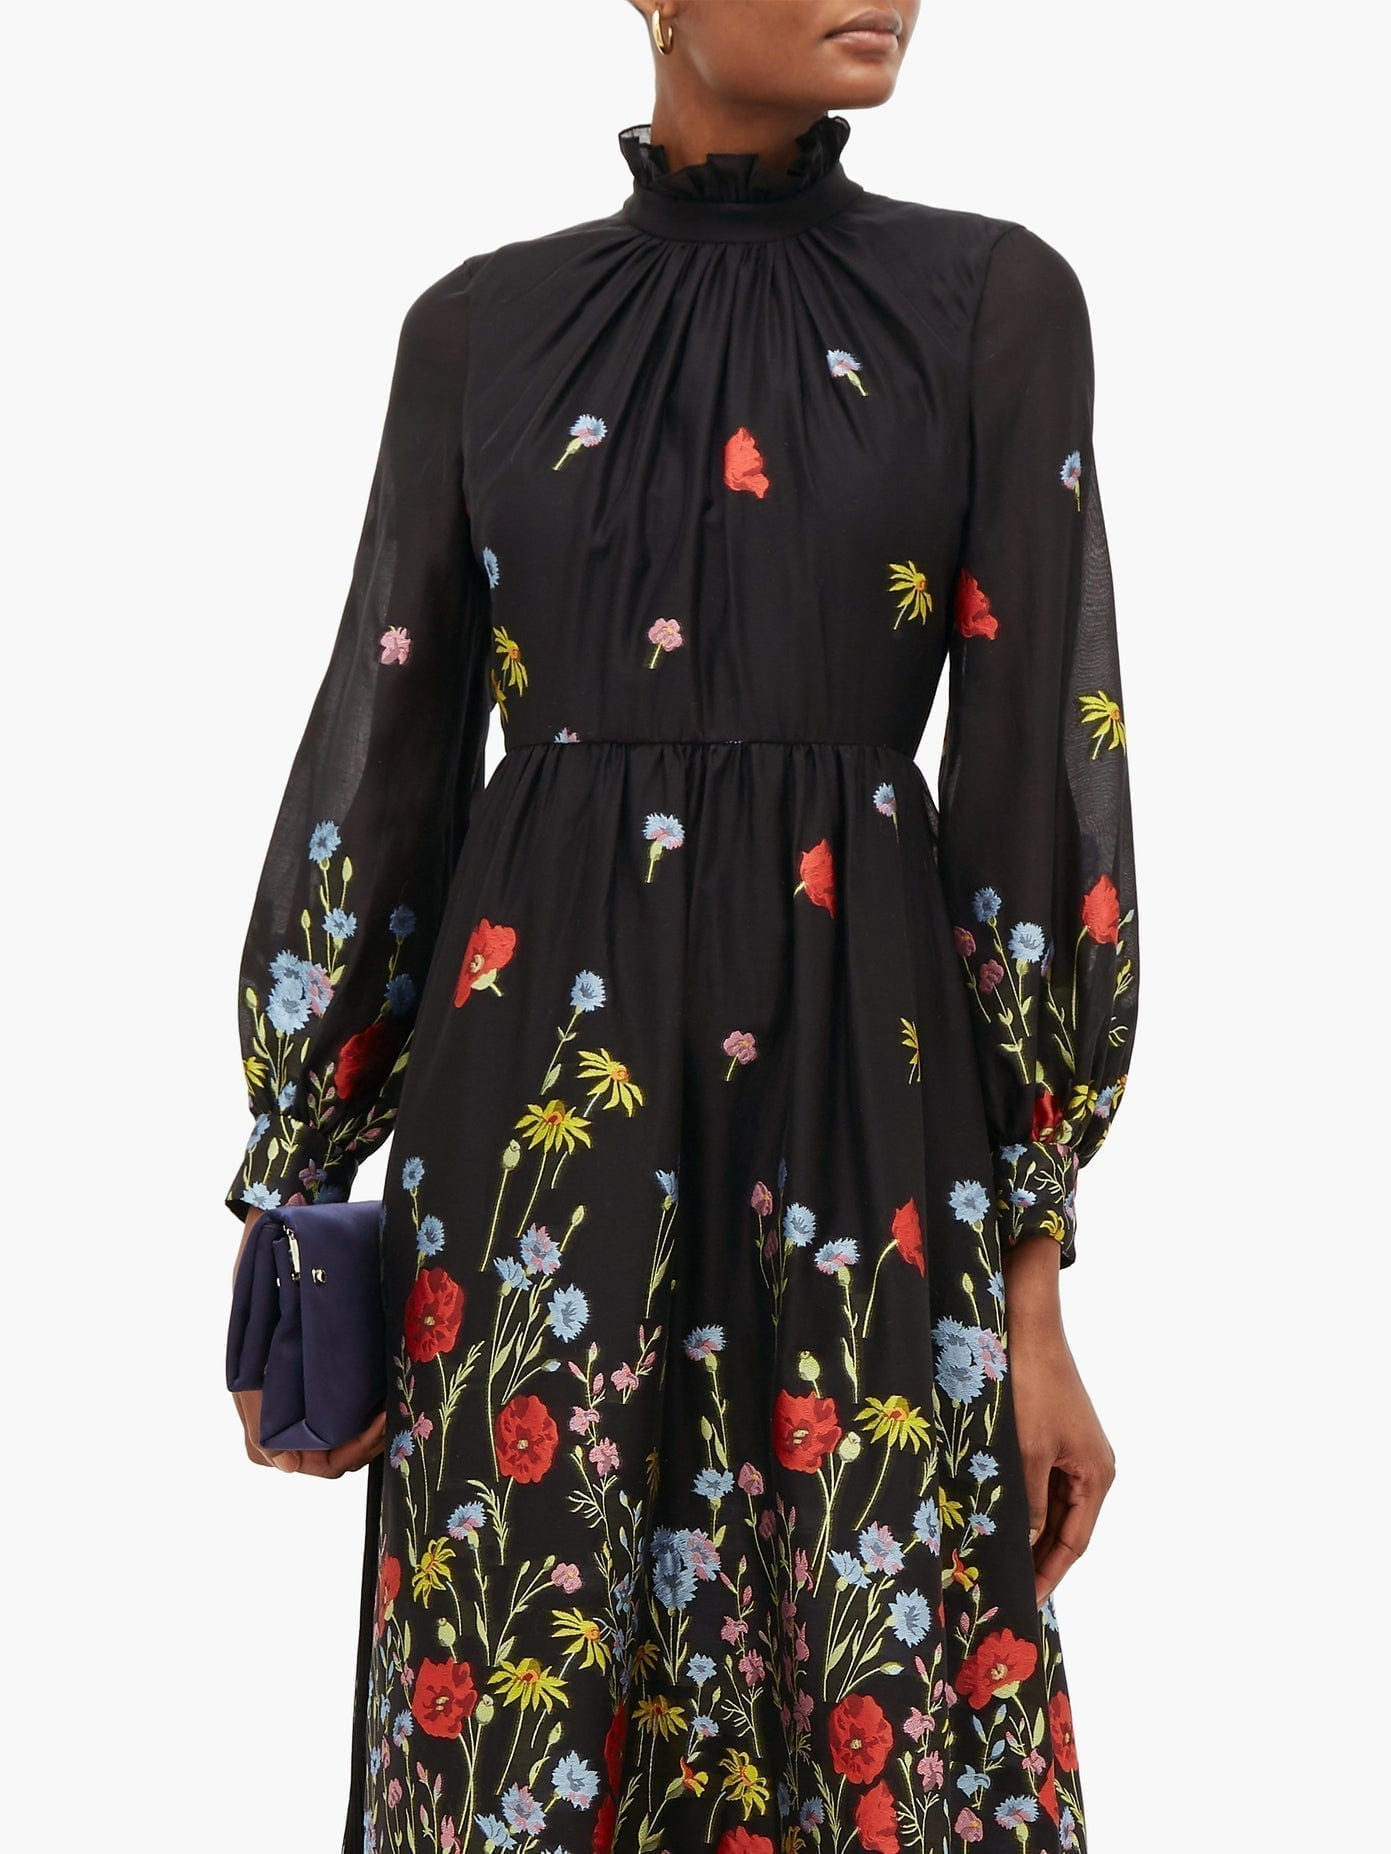 ERDEM Clementine Floral-Embroidered Organza Gown